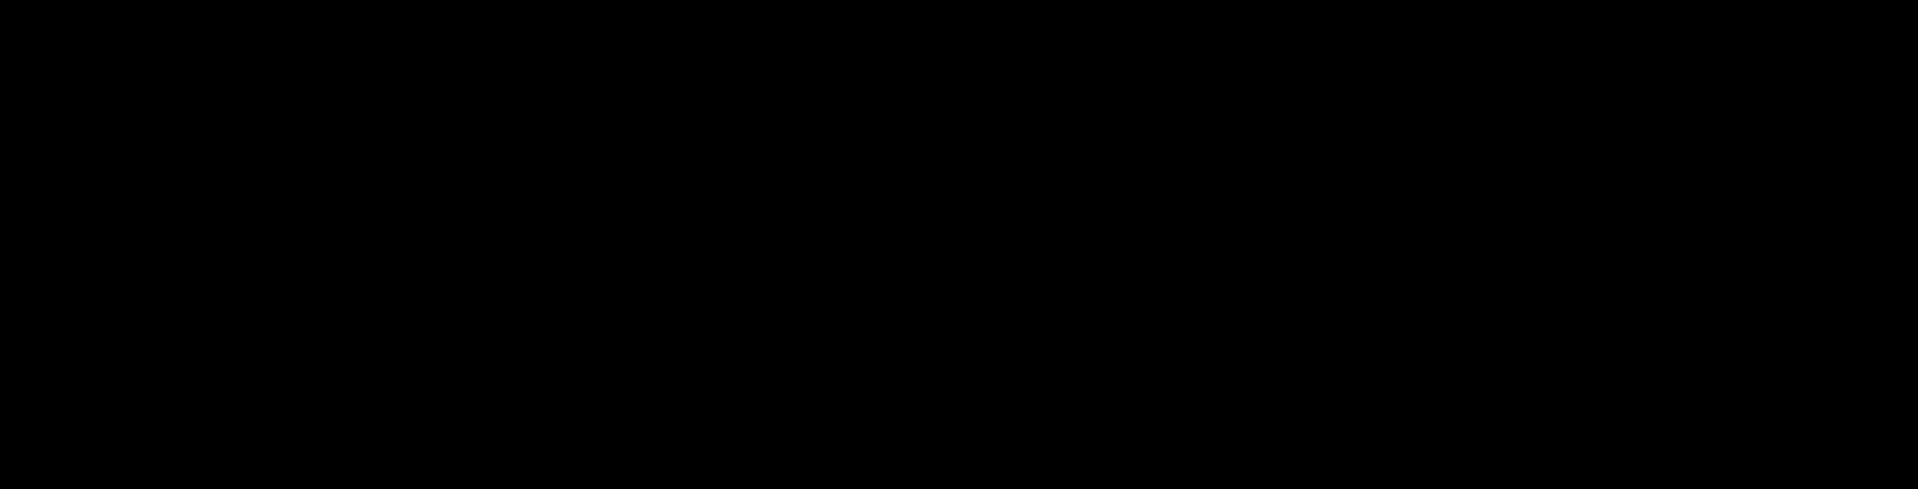 TAKEOFF〜アスリートのジャンプ力向上のためのトレーニング〜